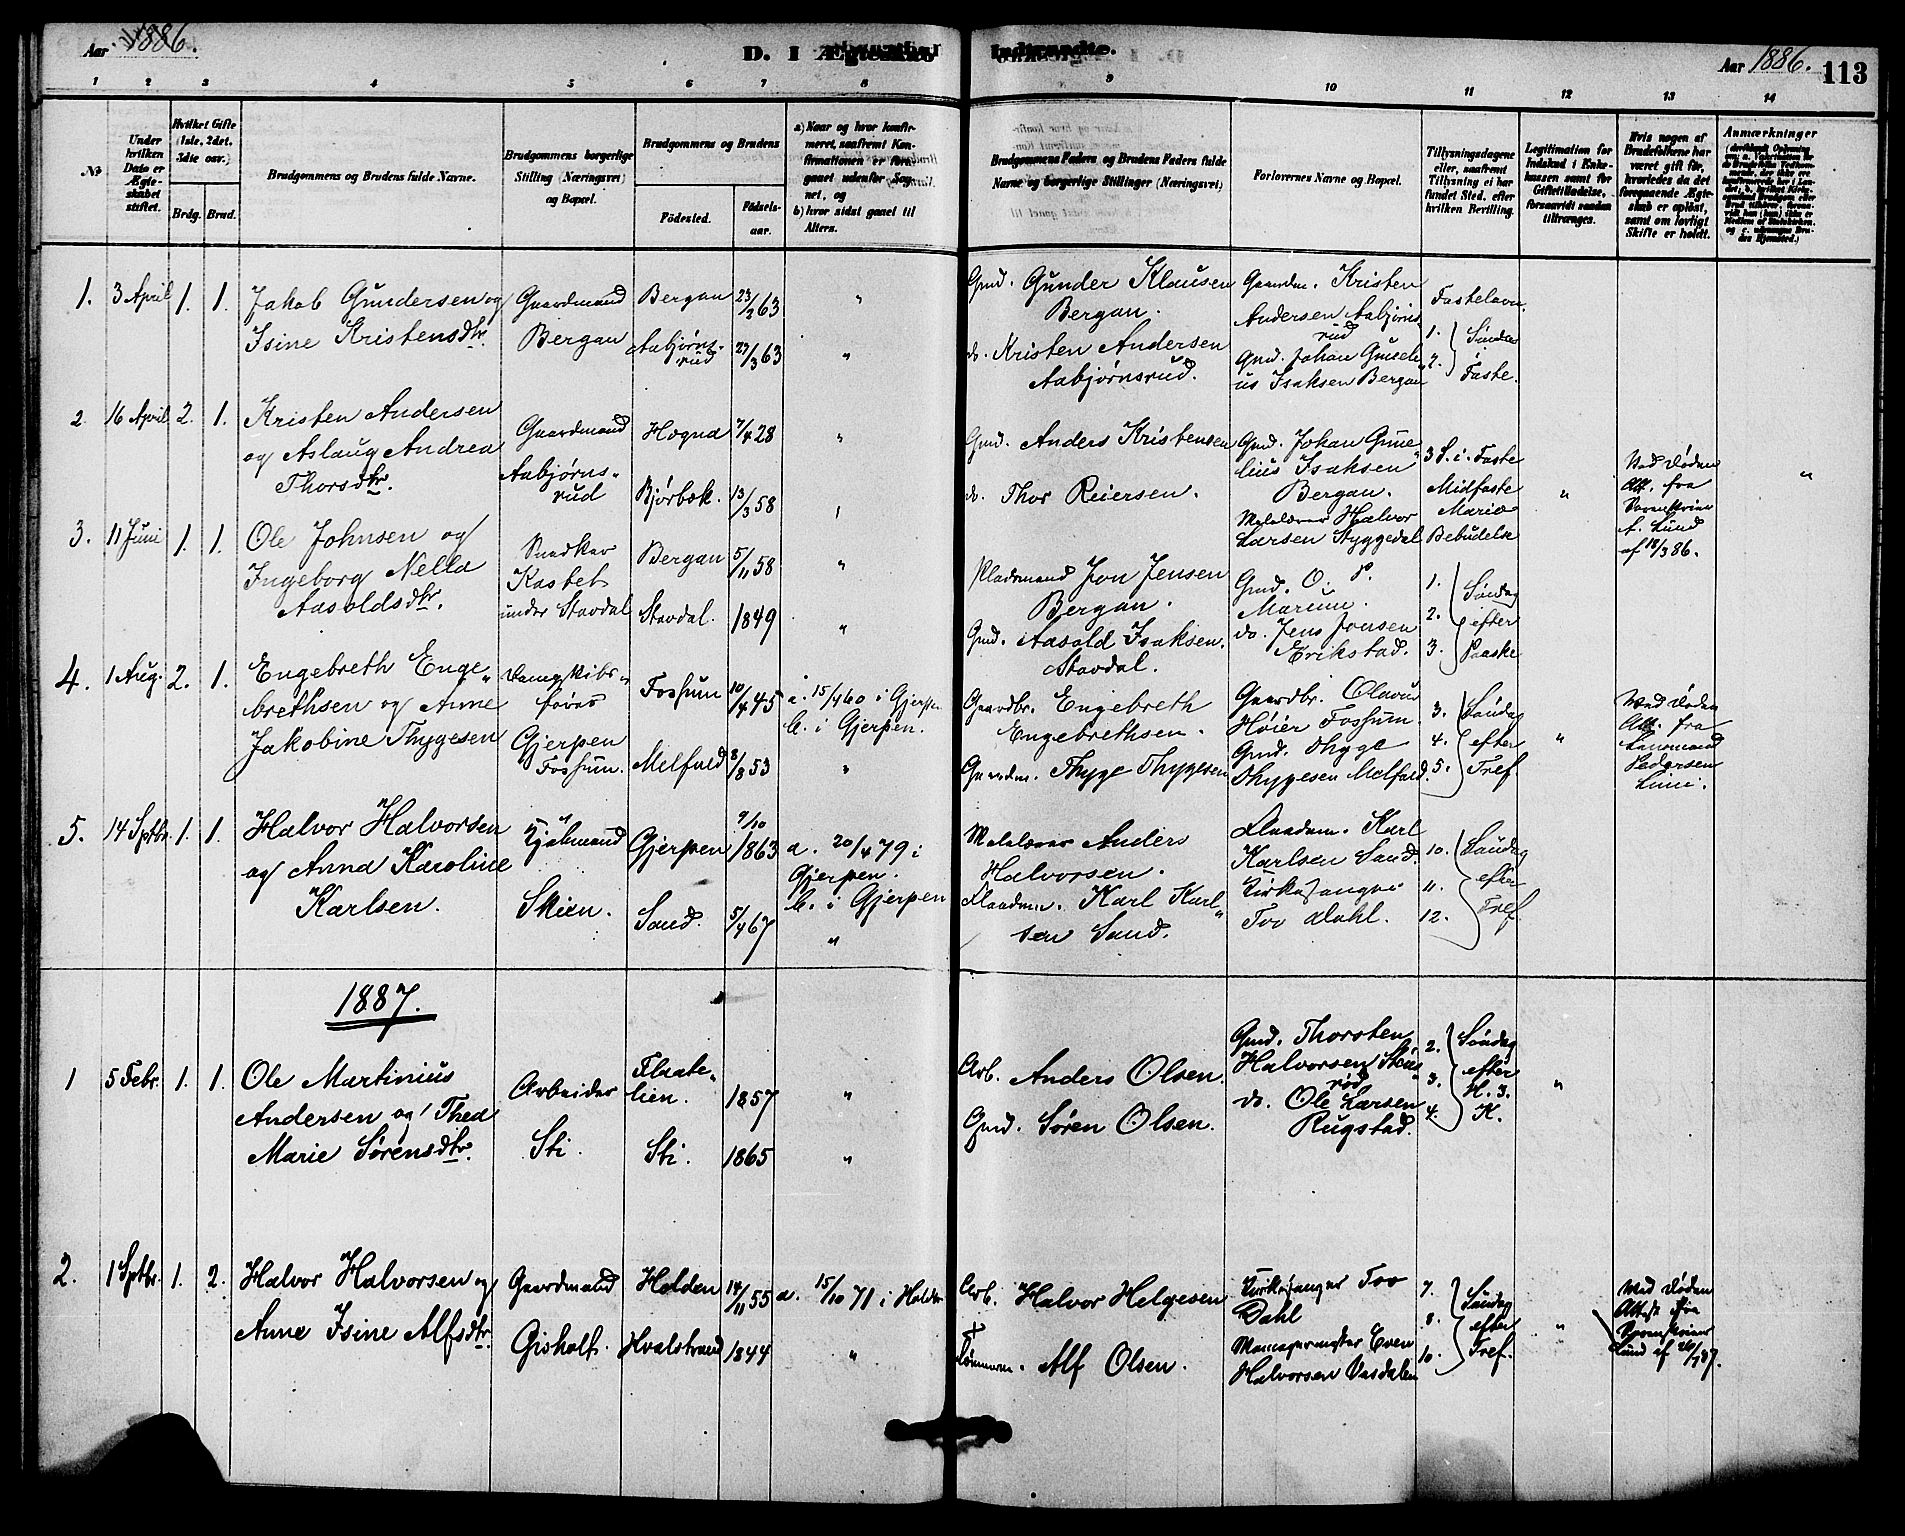 SAKO, Solum kirkebøker, F/Fb/L0001: Ministerialbok nr. II 1, 1877-1892, s. 113